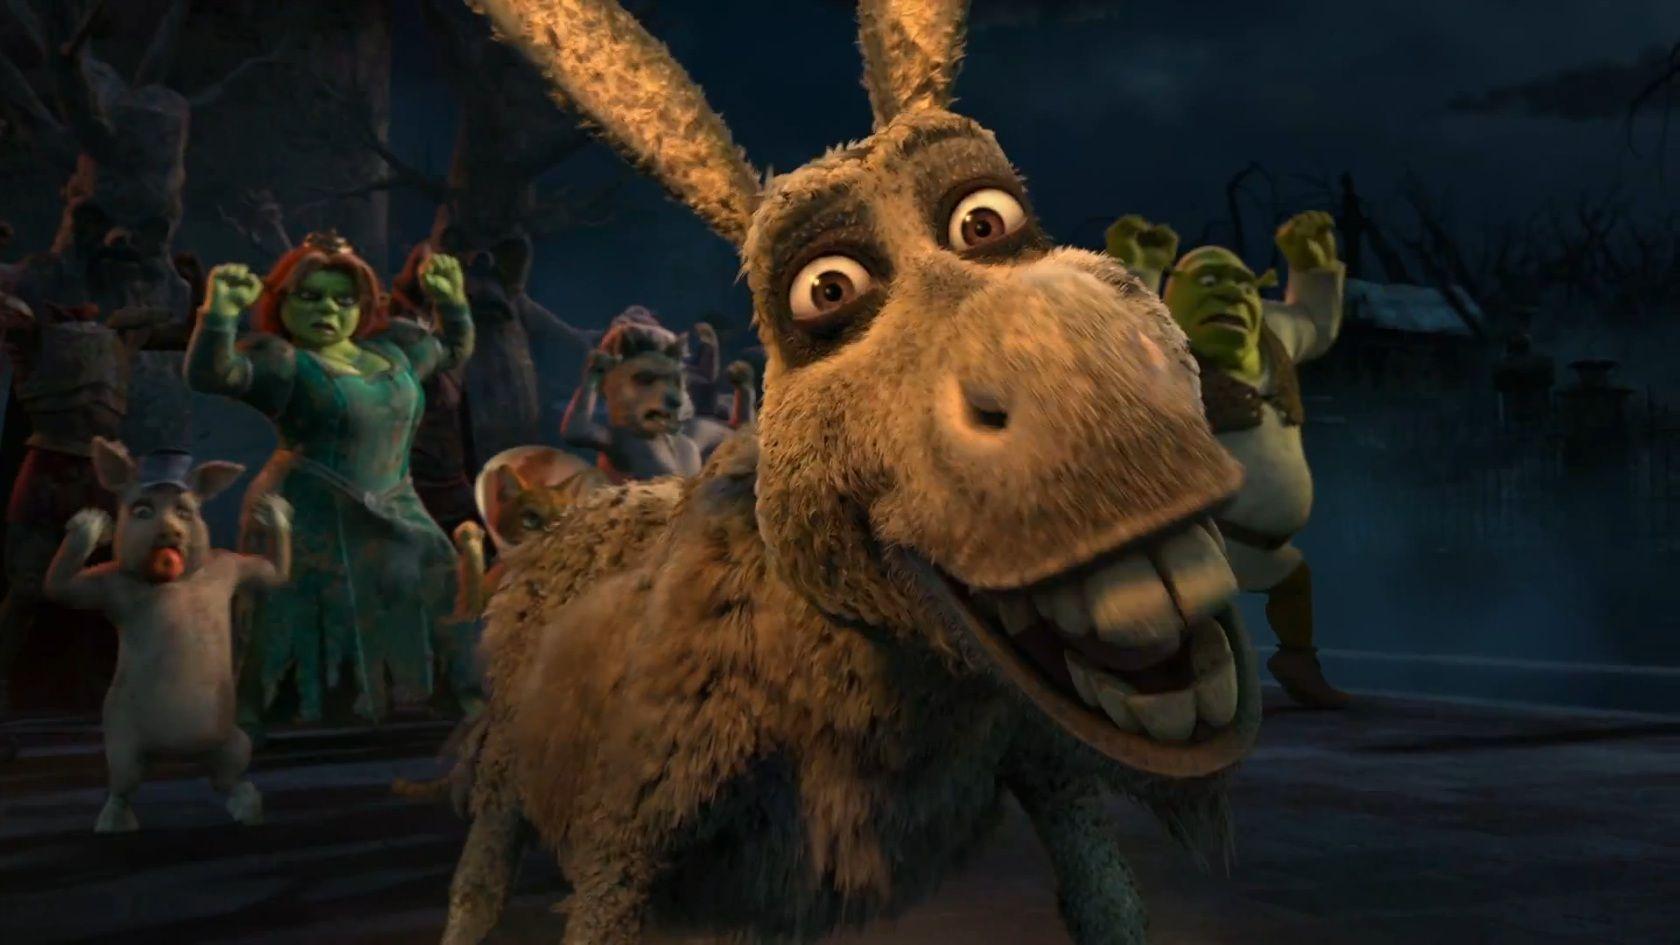 Scared Shrekless Thriller Night Zombie Donkey Jpg Zombie Cartoon Zombie Thriller